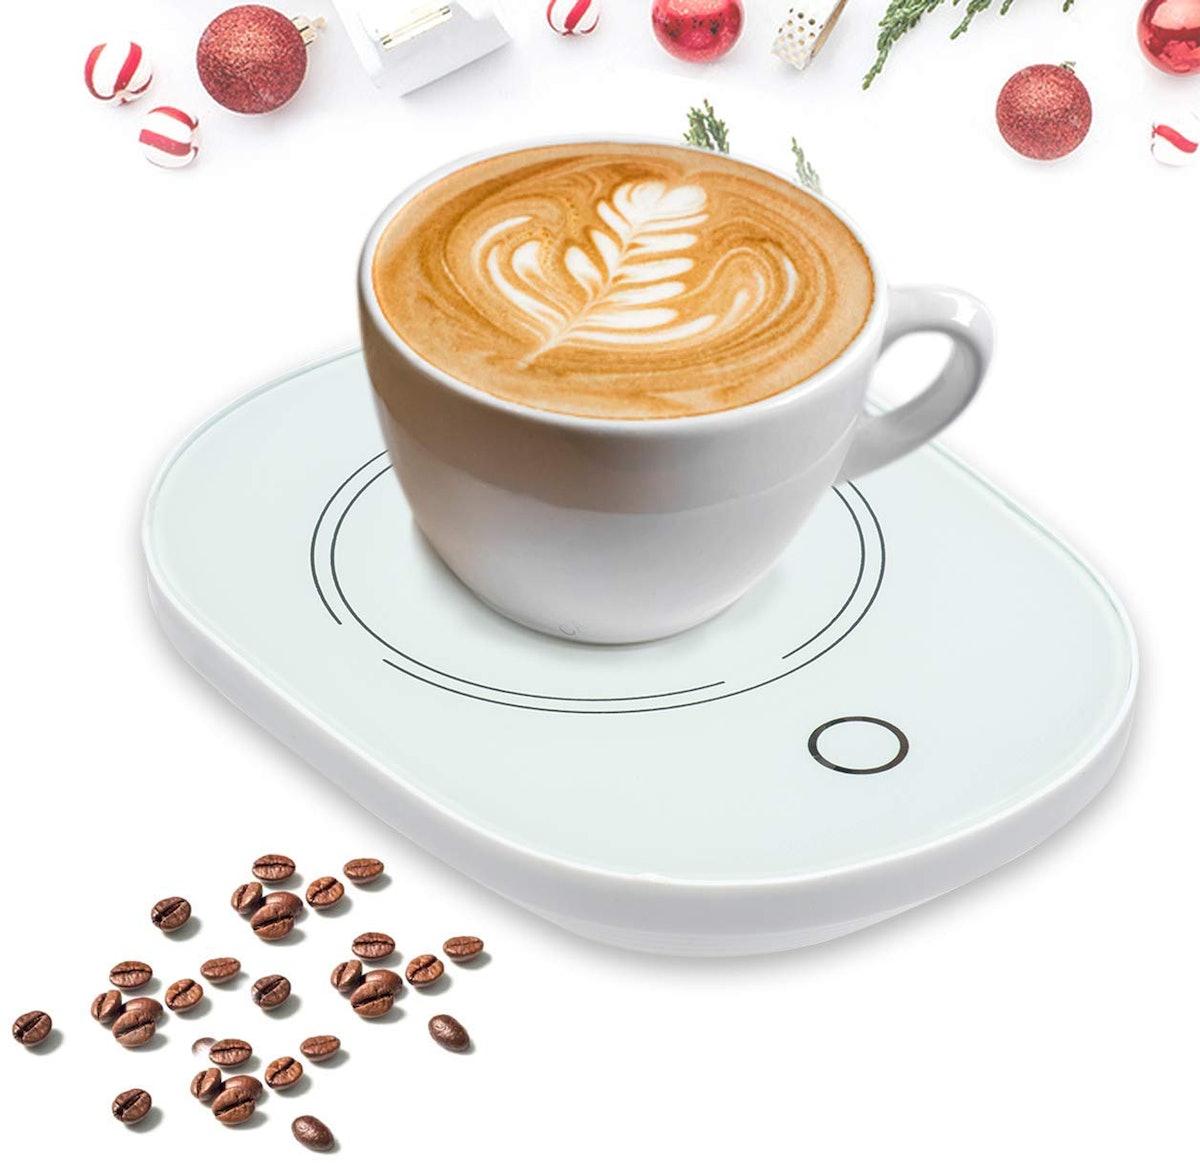 EASYSO Cup Warmer